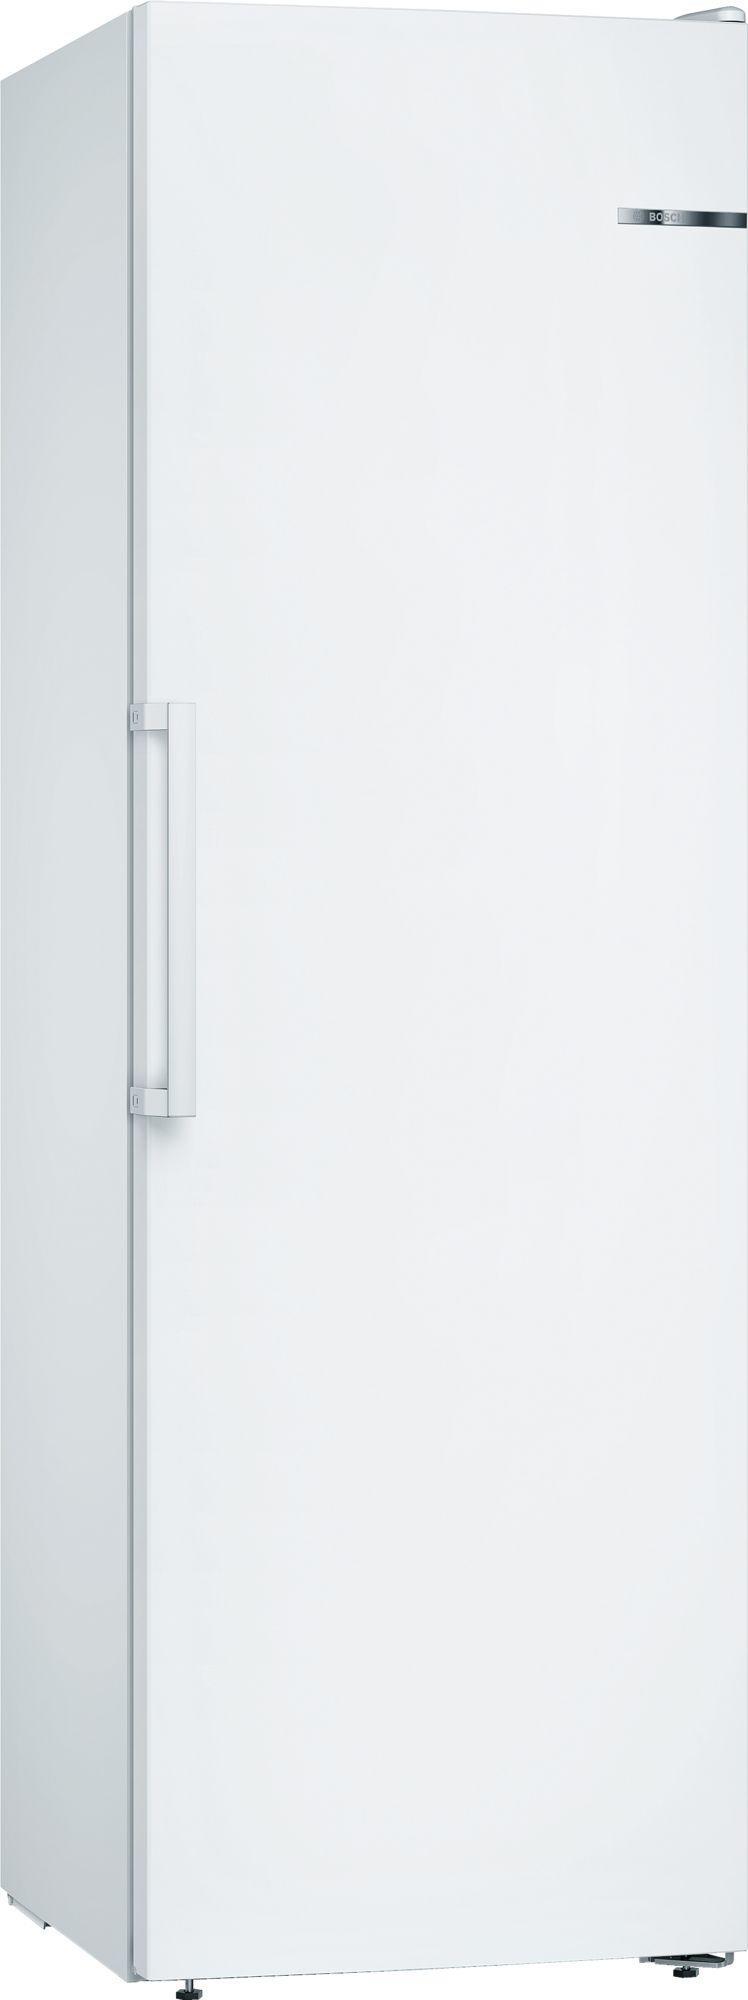 Image of Serie 4 GSN36VWFPG 60cm 242 Litre Frost Free Tall Single Door Freezer | White